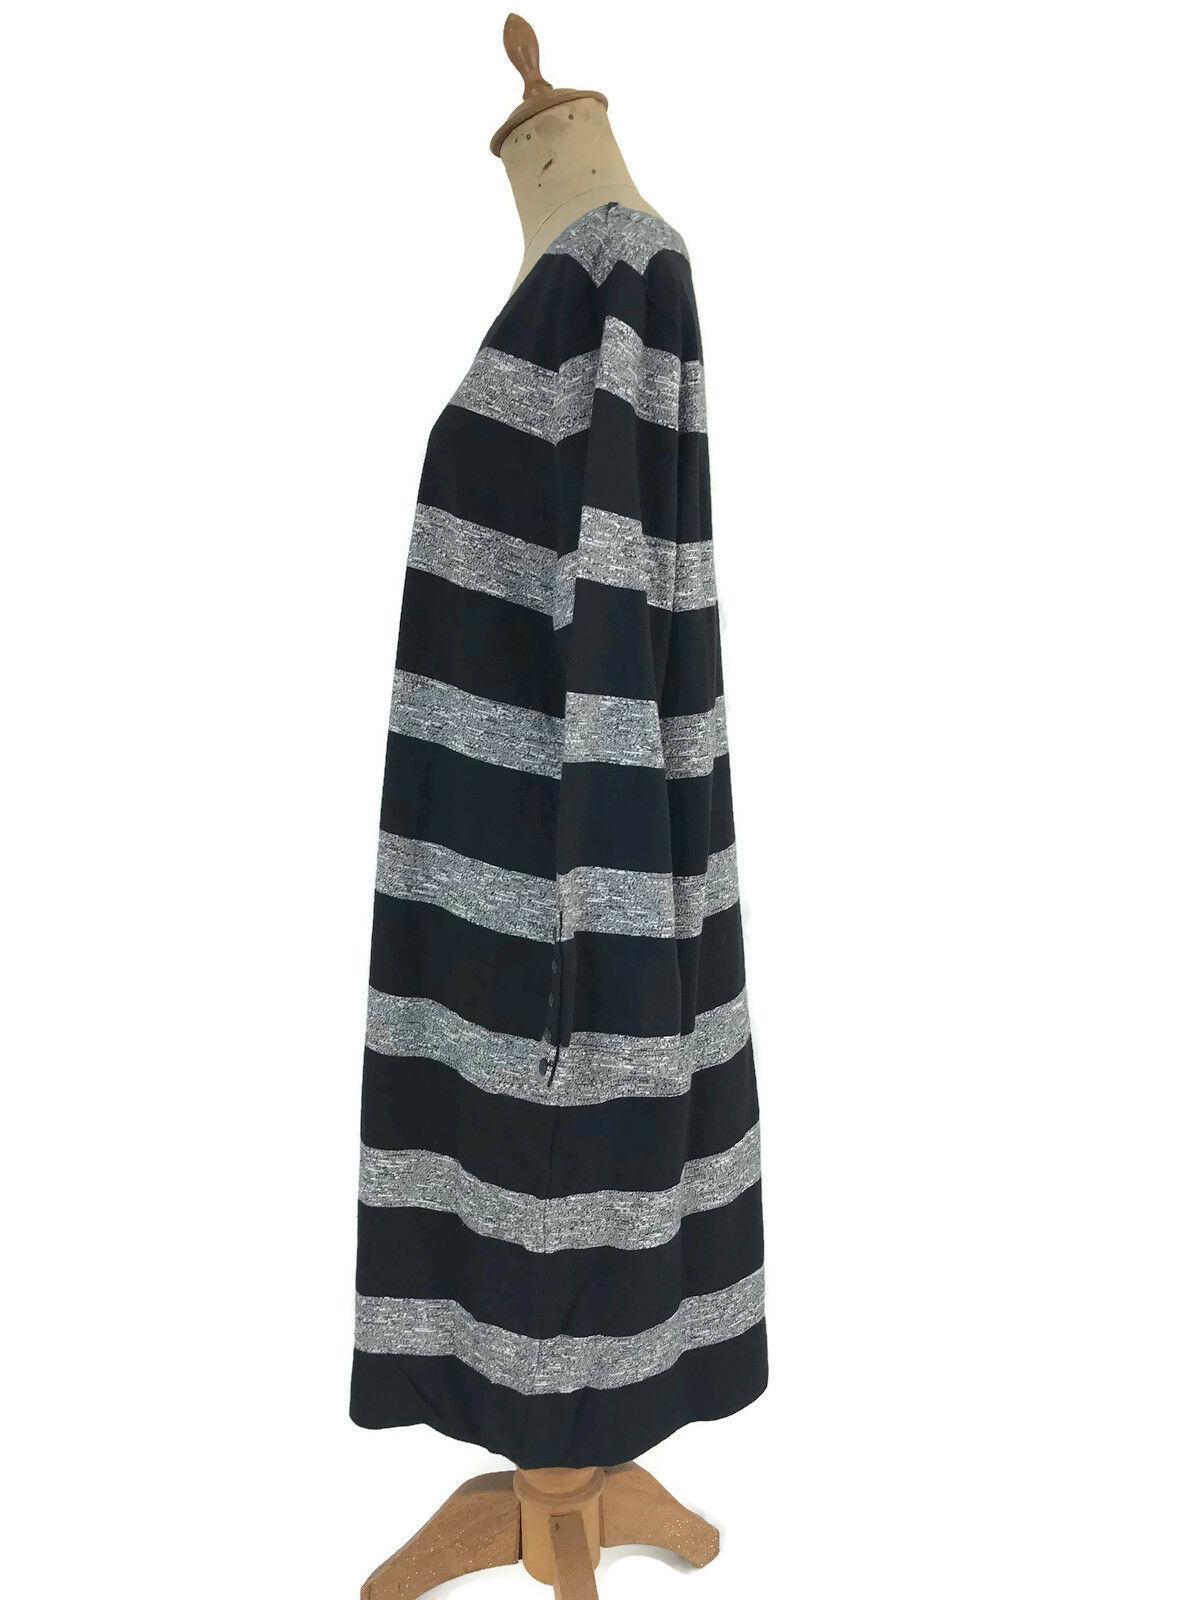 J. Crew Factory Dress Black Gray Stripe Boatneck 3/4 Sleeves Style 02665 Sz L U1 image 3